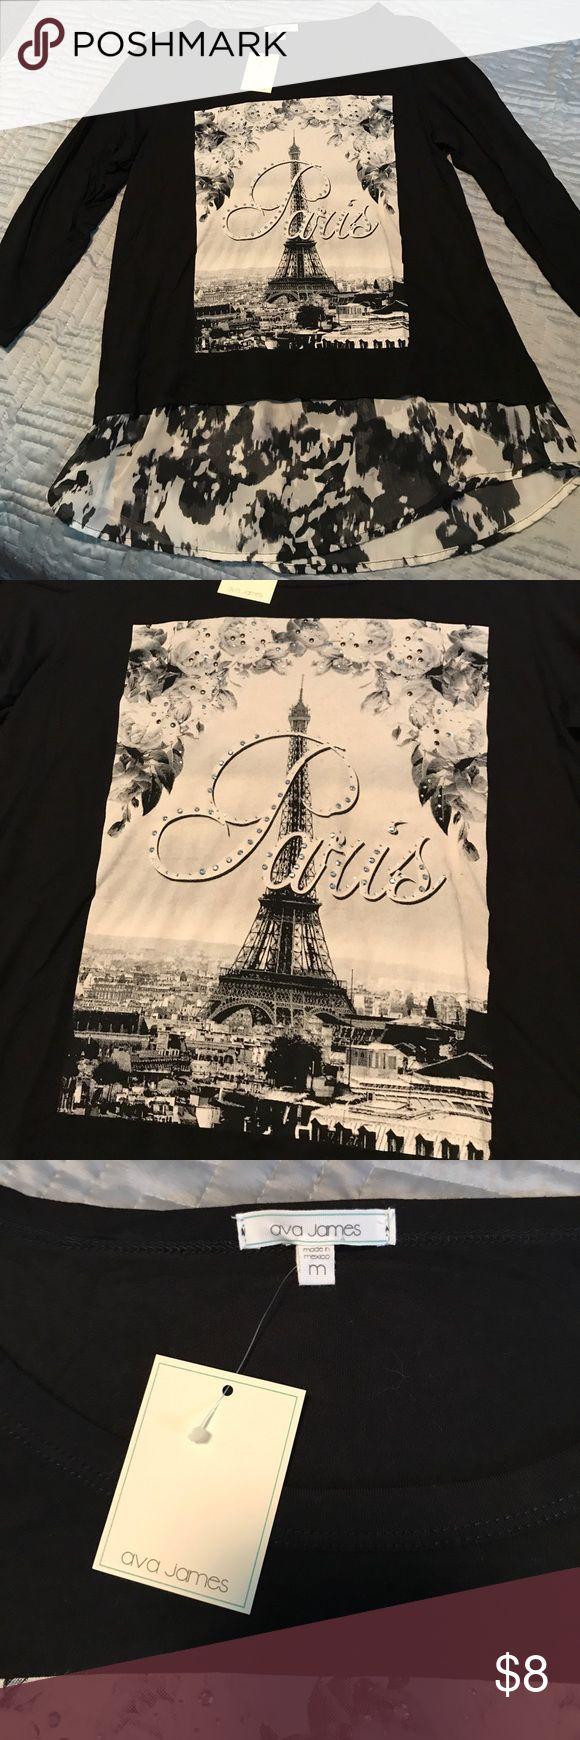 Ava James Paris Shirt Ava James Paris Shirt with 3/4 length sleeves. Great chiffon at the bottom of top. NWT. Tops Tees - Long Sleeve